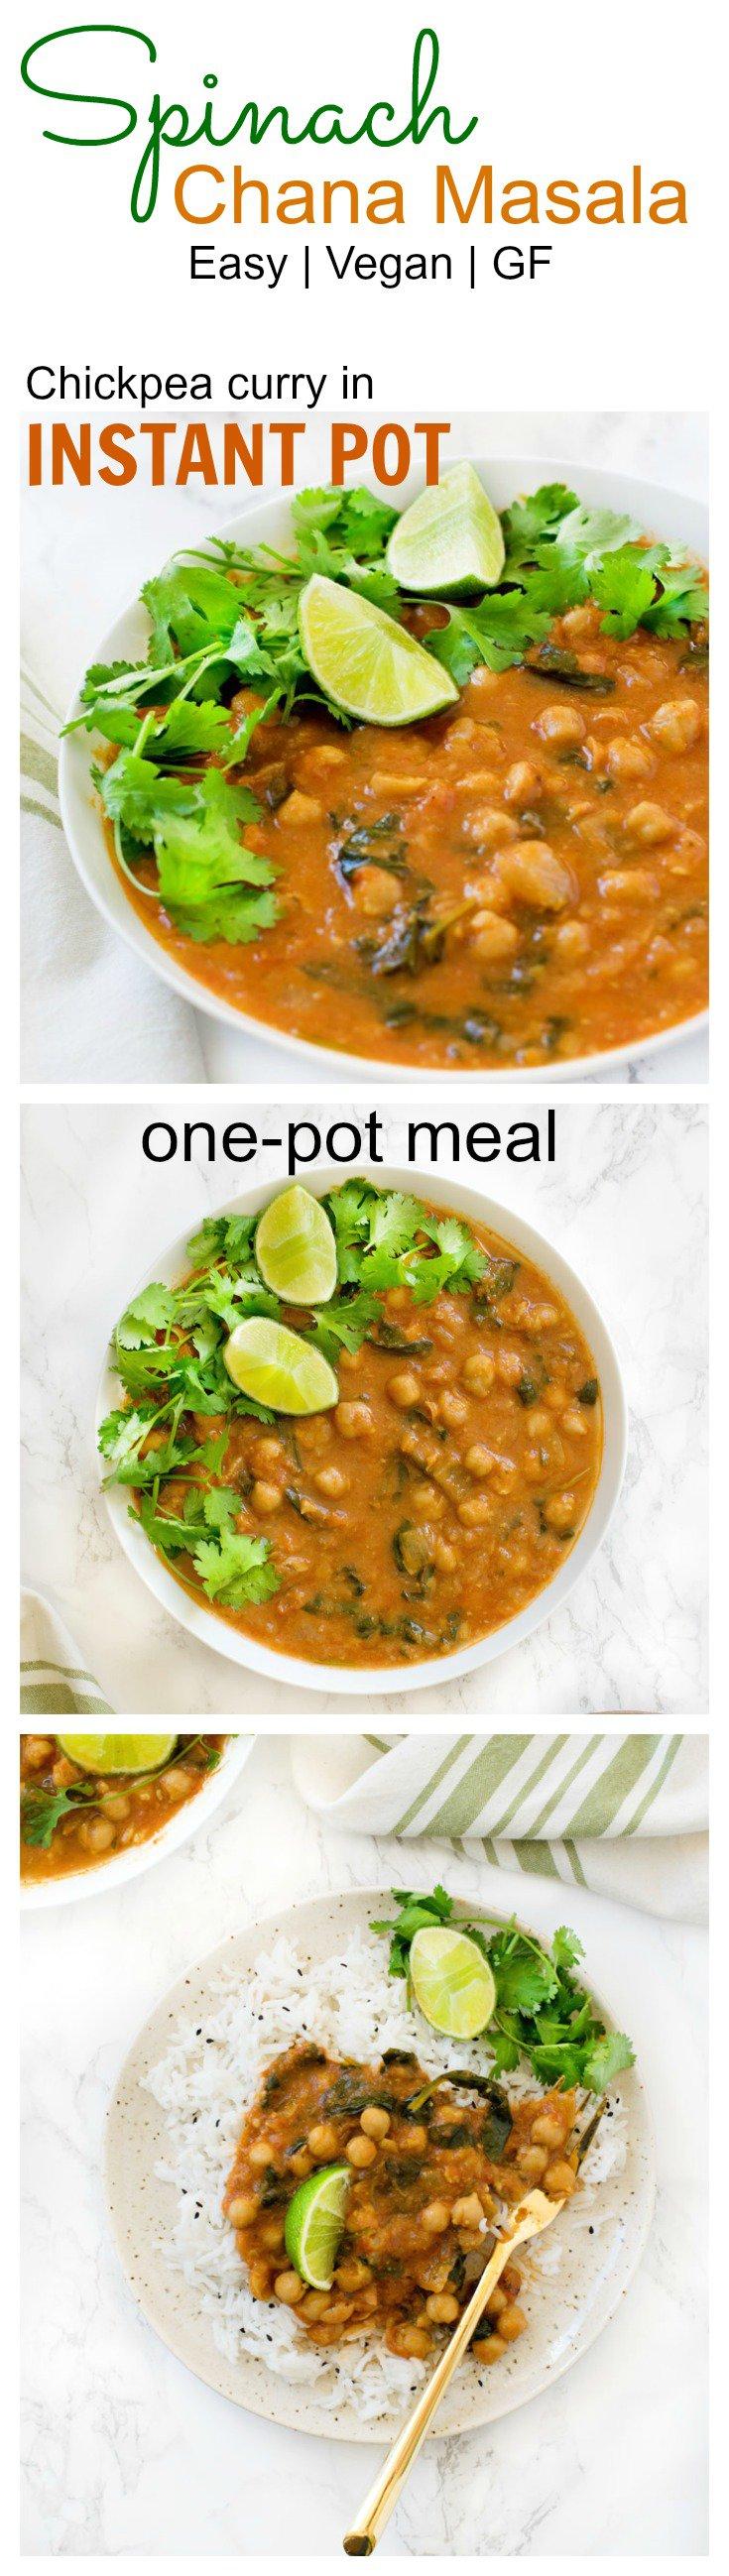 spinach-chana-masala-easy